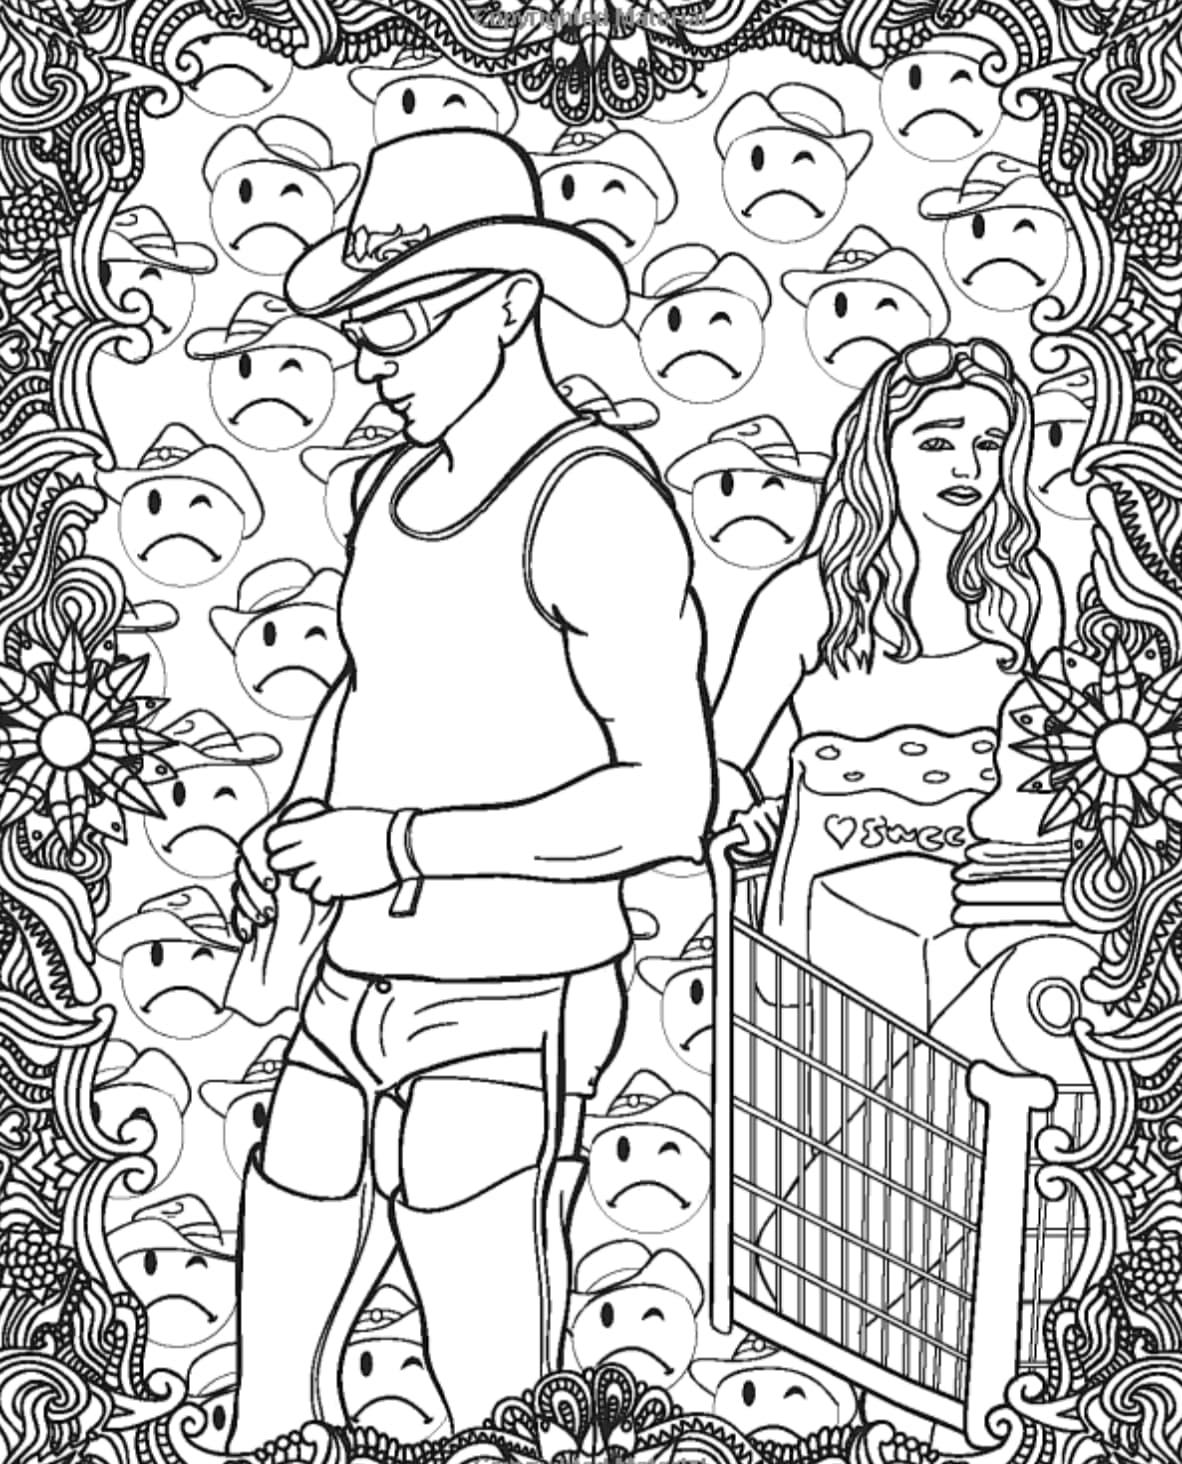 walmart coloring book image